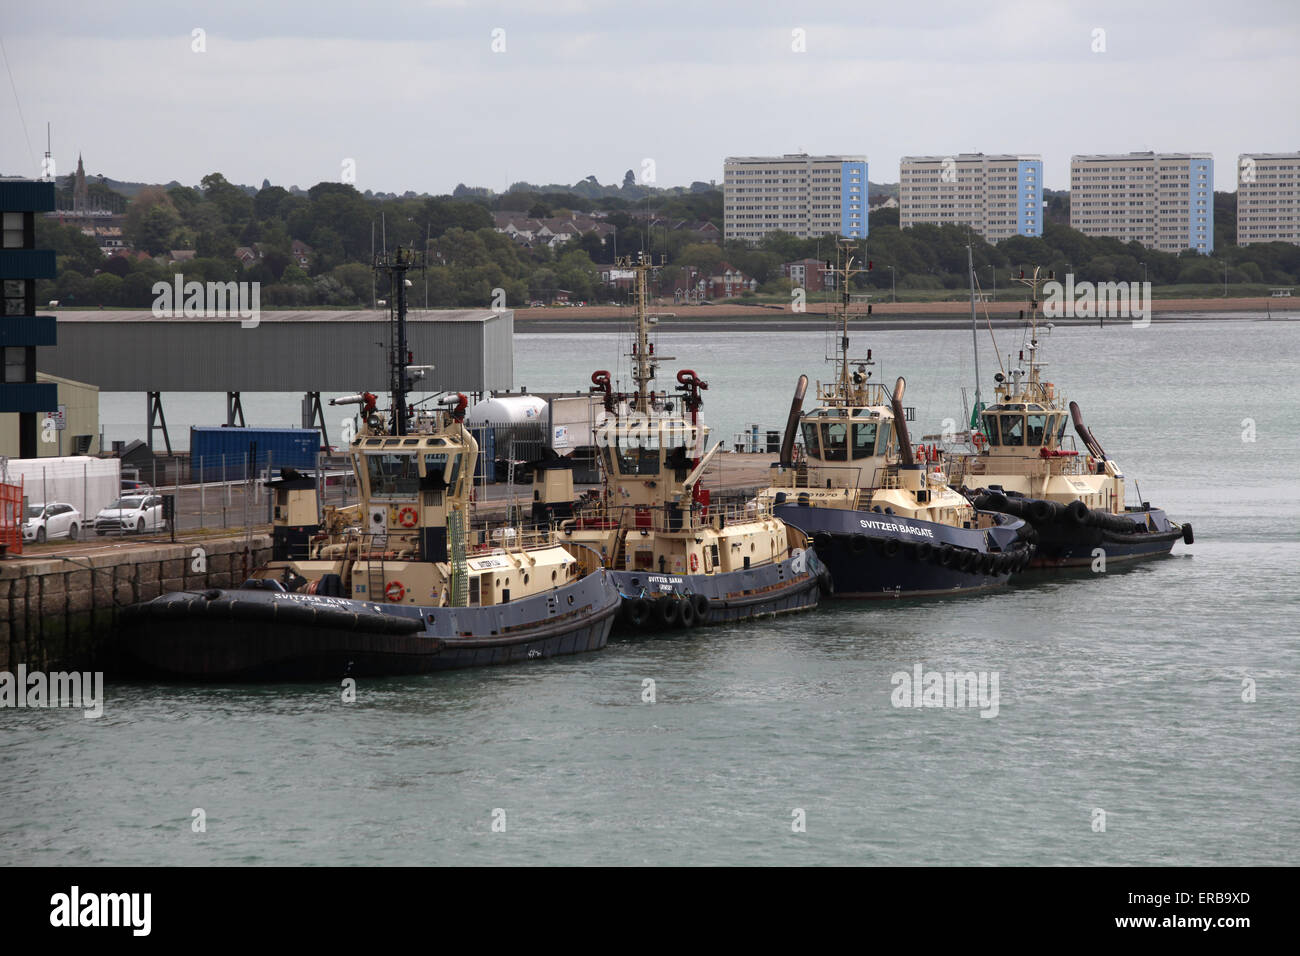 Schleppboote vertäut am Dock Kopf in Southampton Docks Stockbild